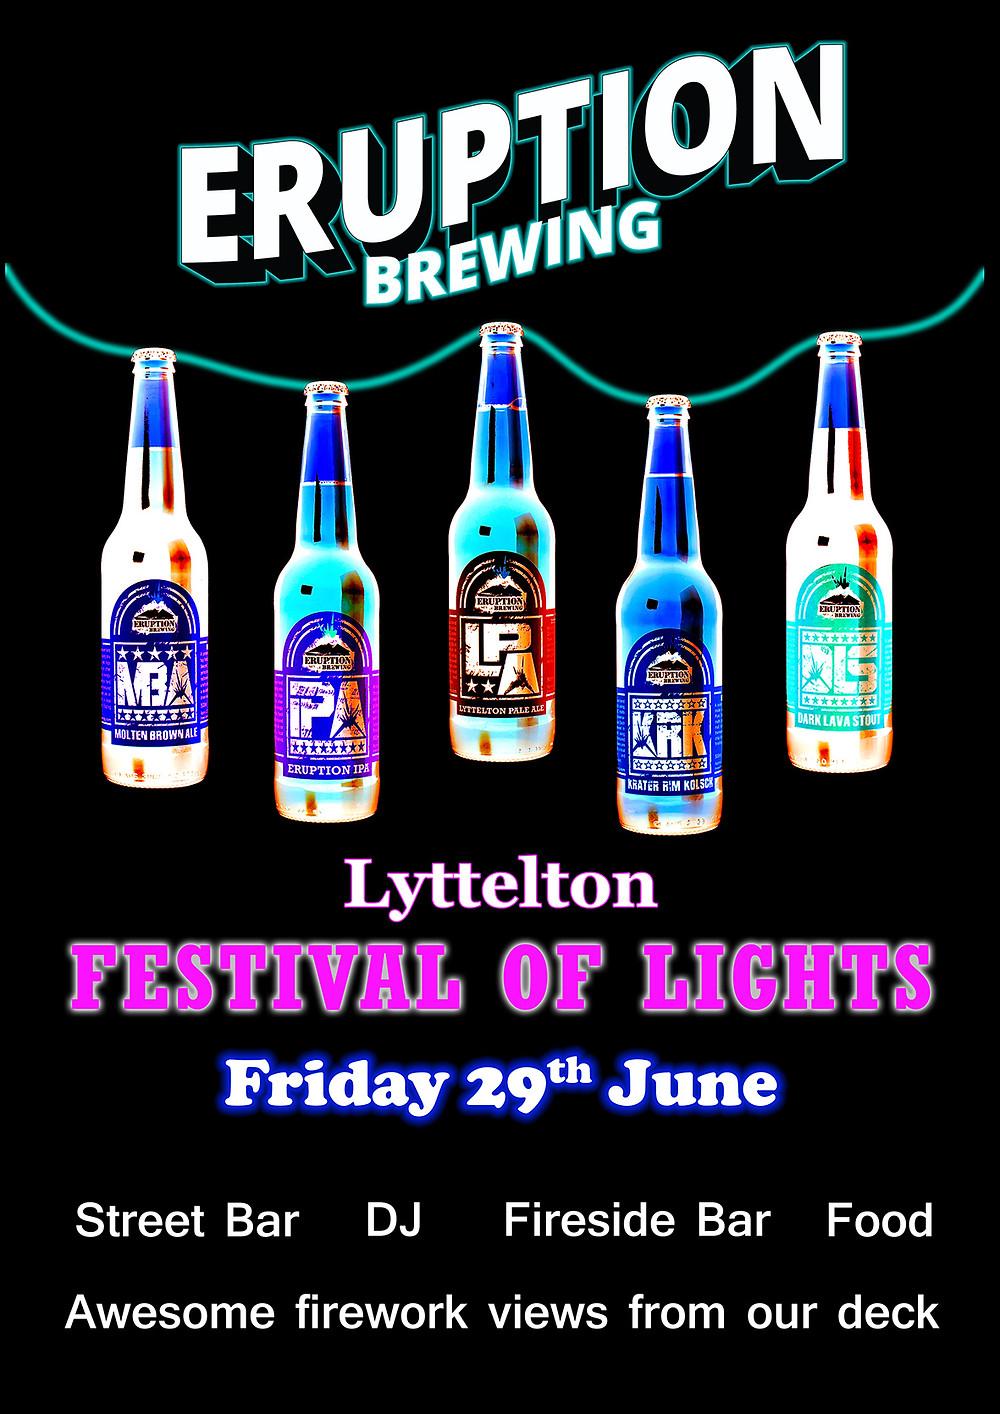 Eruption Brewing Lyttelton